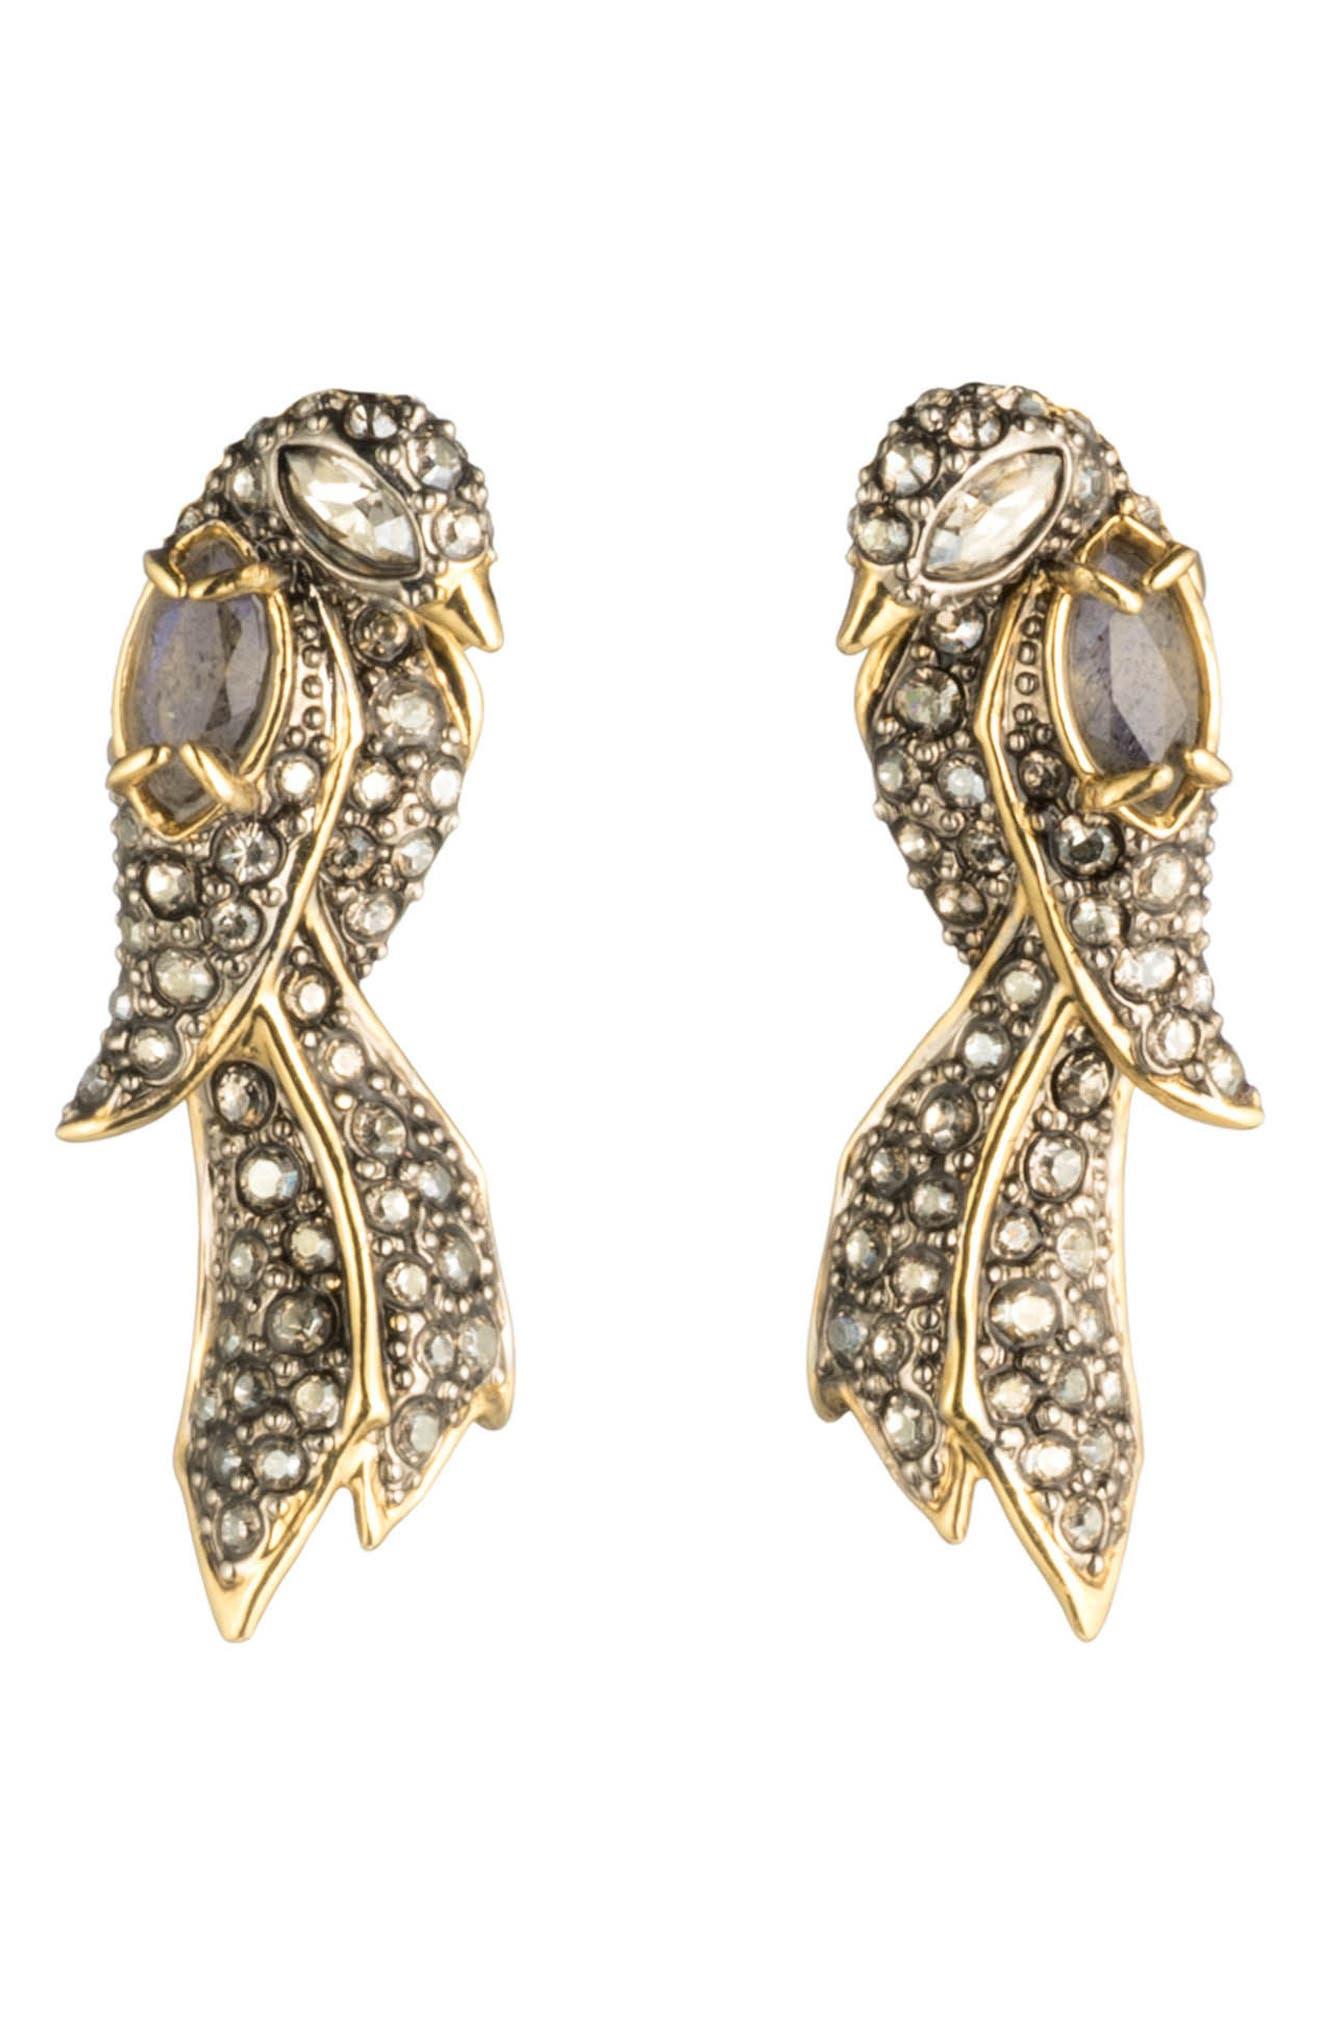 Lovebird Post Earrings,                         Main,                         color, GOLD/ SILVER